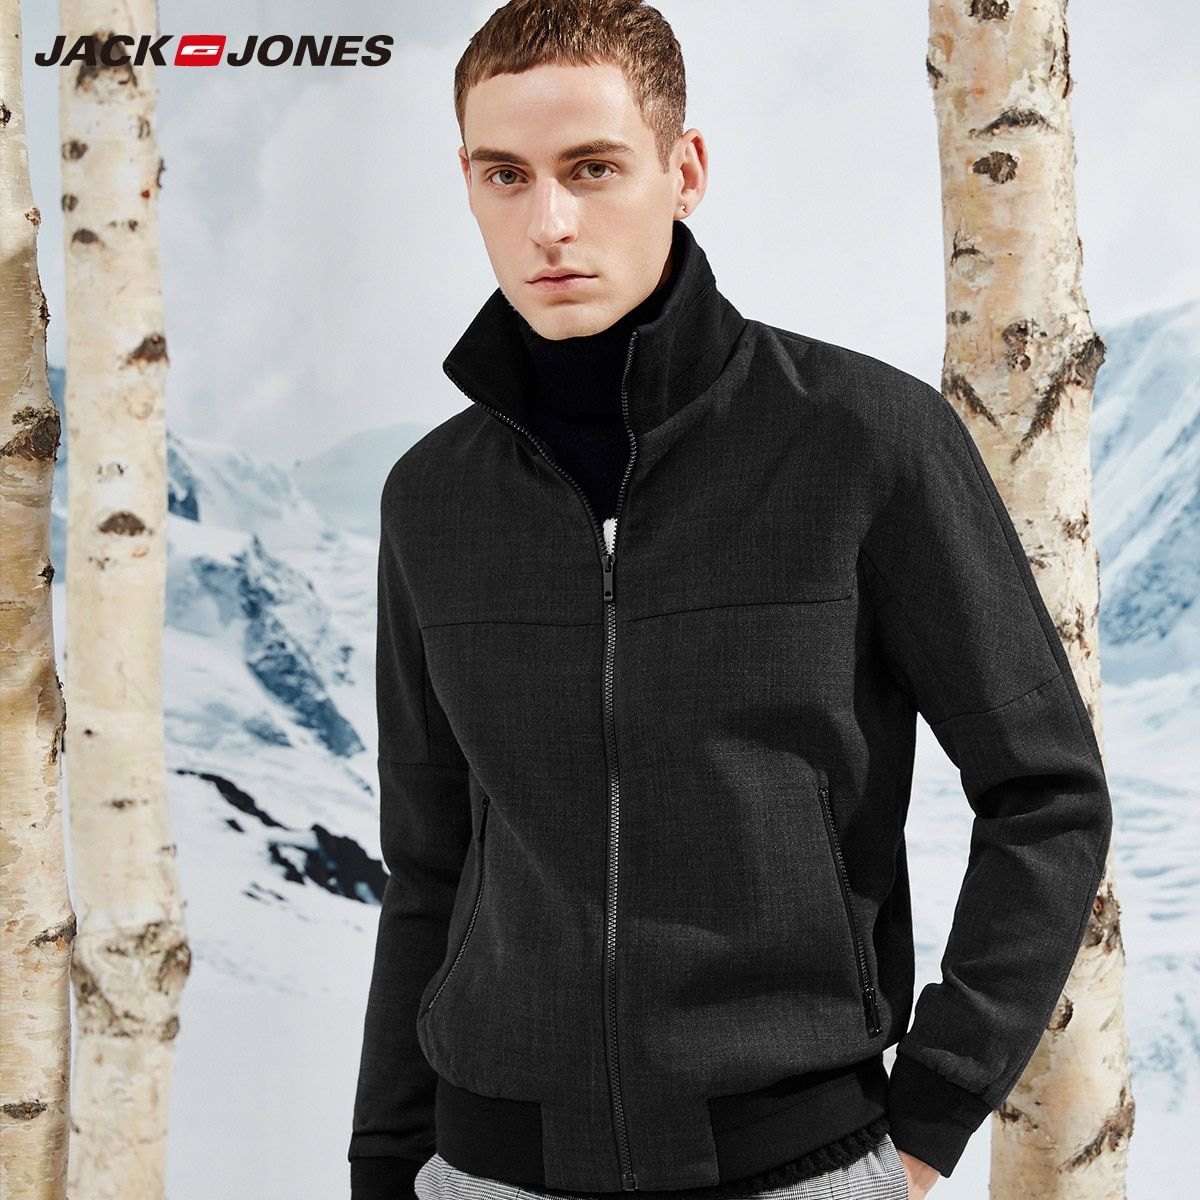 JackJones Men's Wool contained jacket Slim Shirt Casual gothic Black Goth Men Long Sleeve Jacket Menswear E|217321557